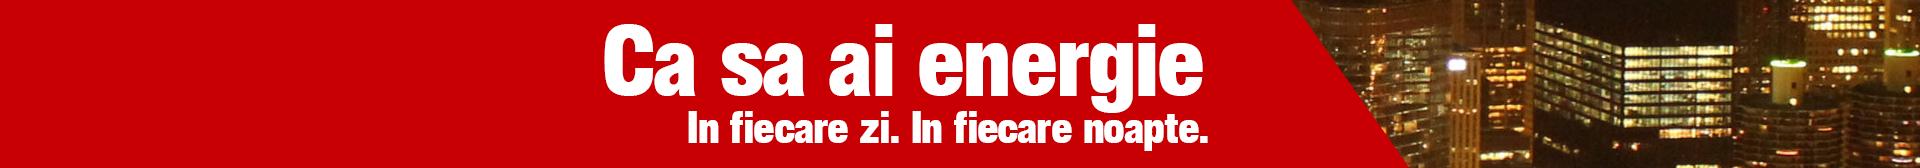 Inelco Mon Proiectare retele lectrice si instalatii electrice in Pitesti